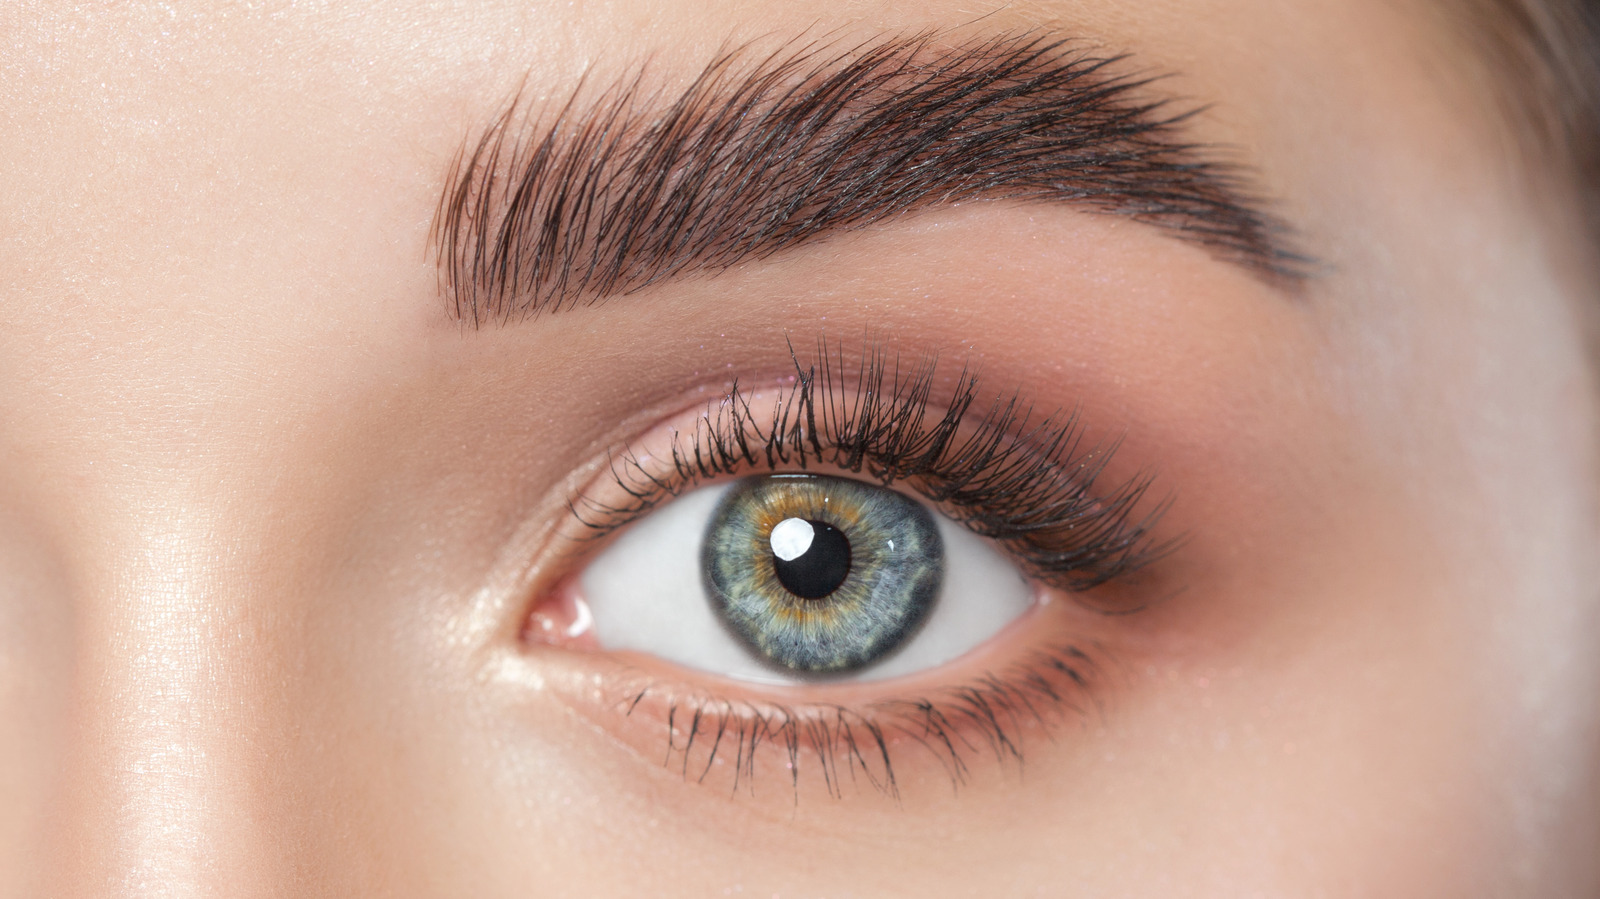 Vaseline for Eyelash Growth? | Tip Tests ♡ | Tips Capsule